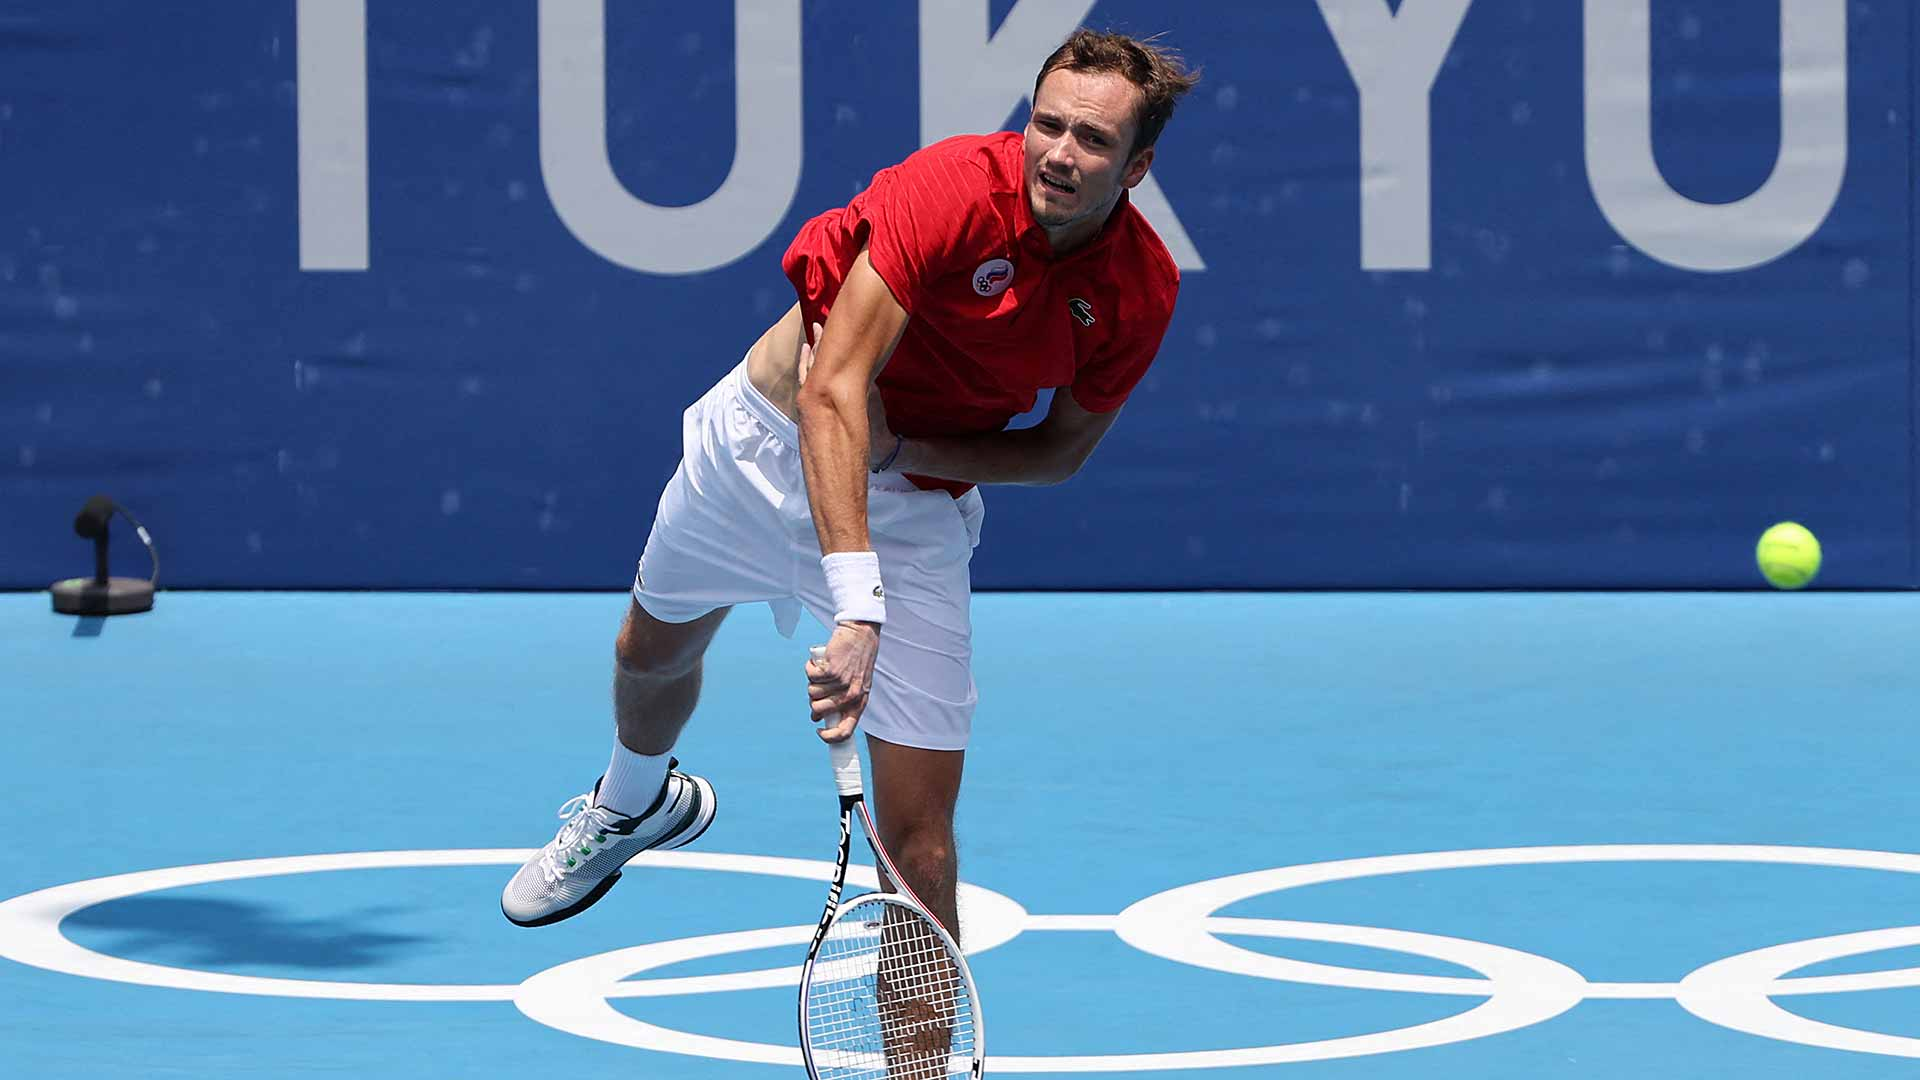 Novak Djokovic the world No. 1 registered a straight-set win over Fokina.